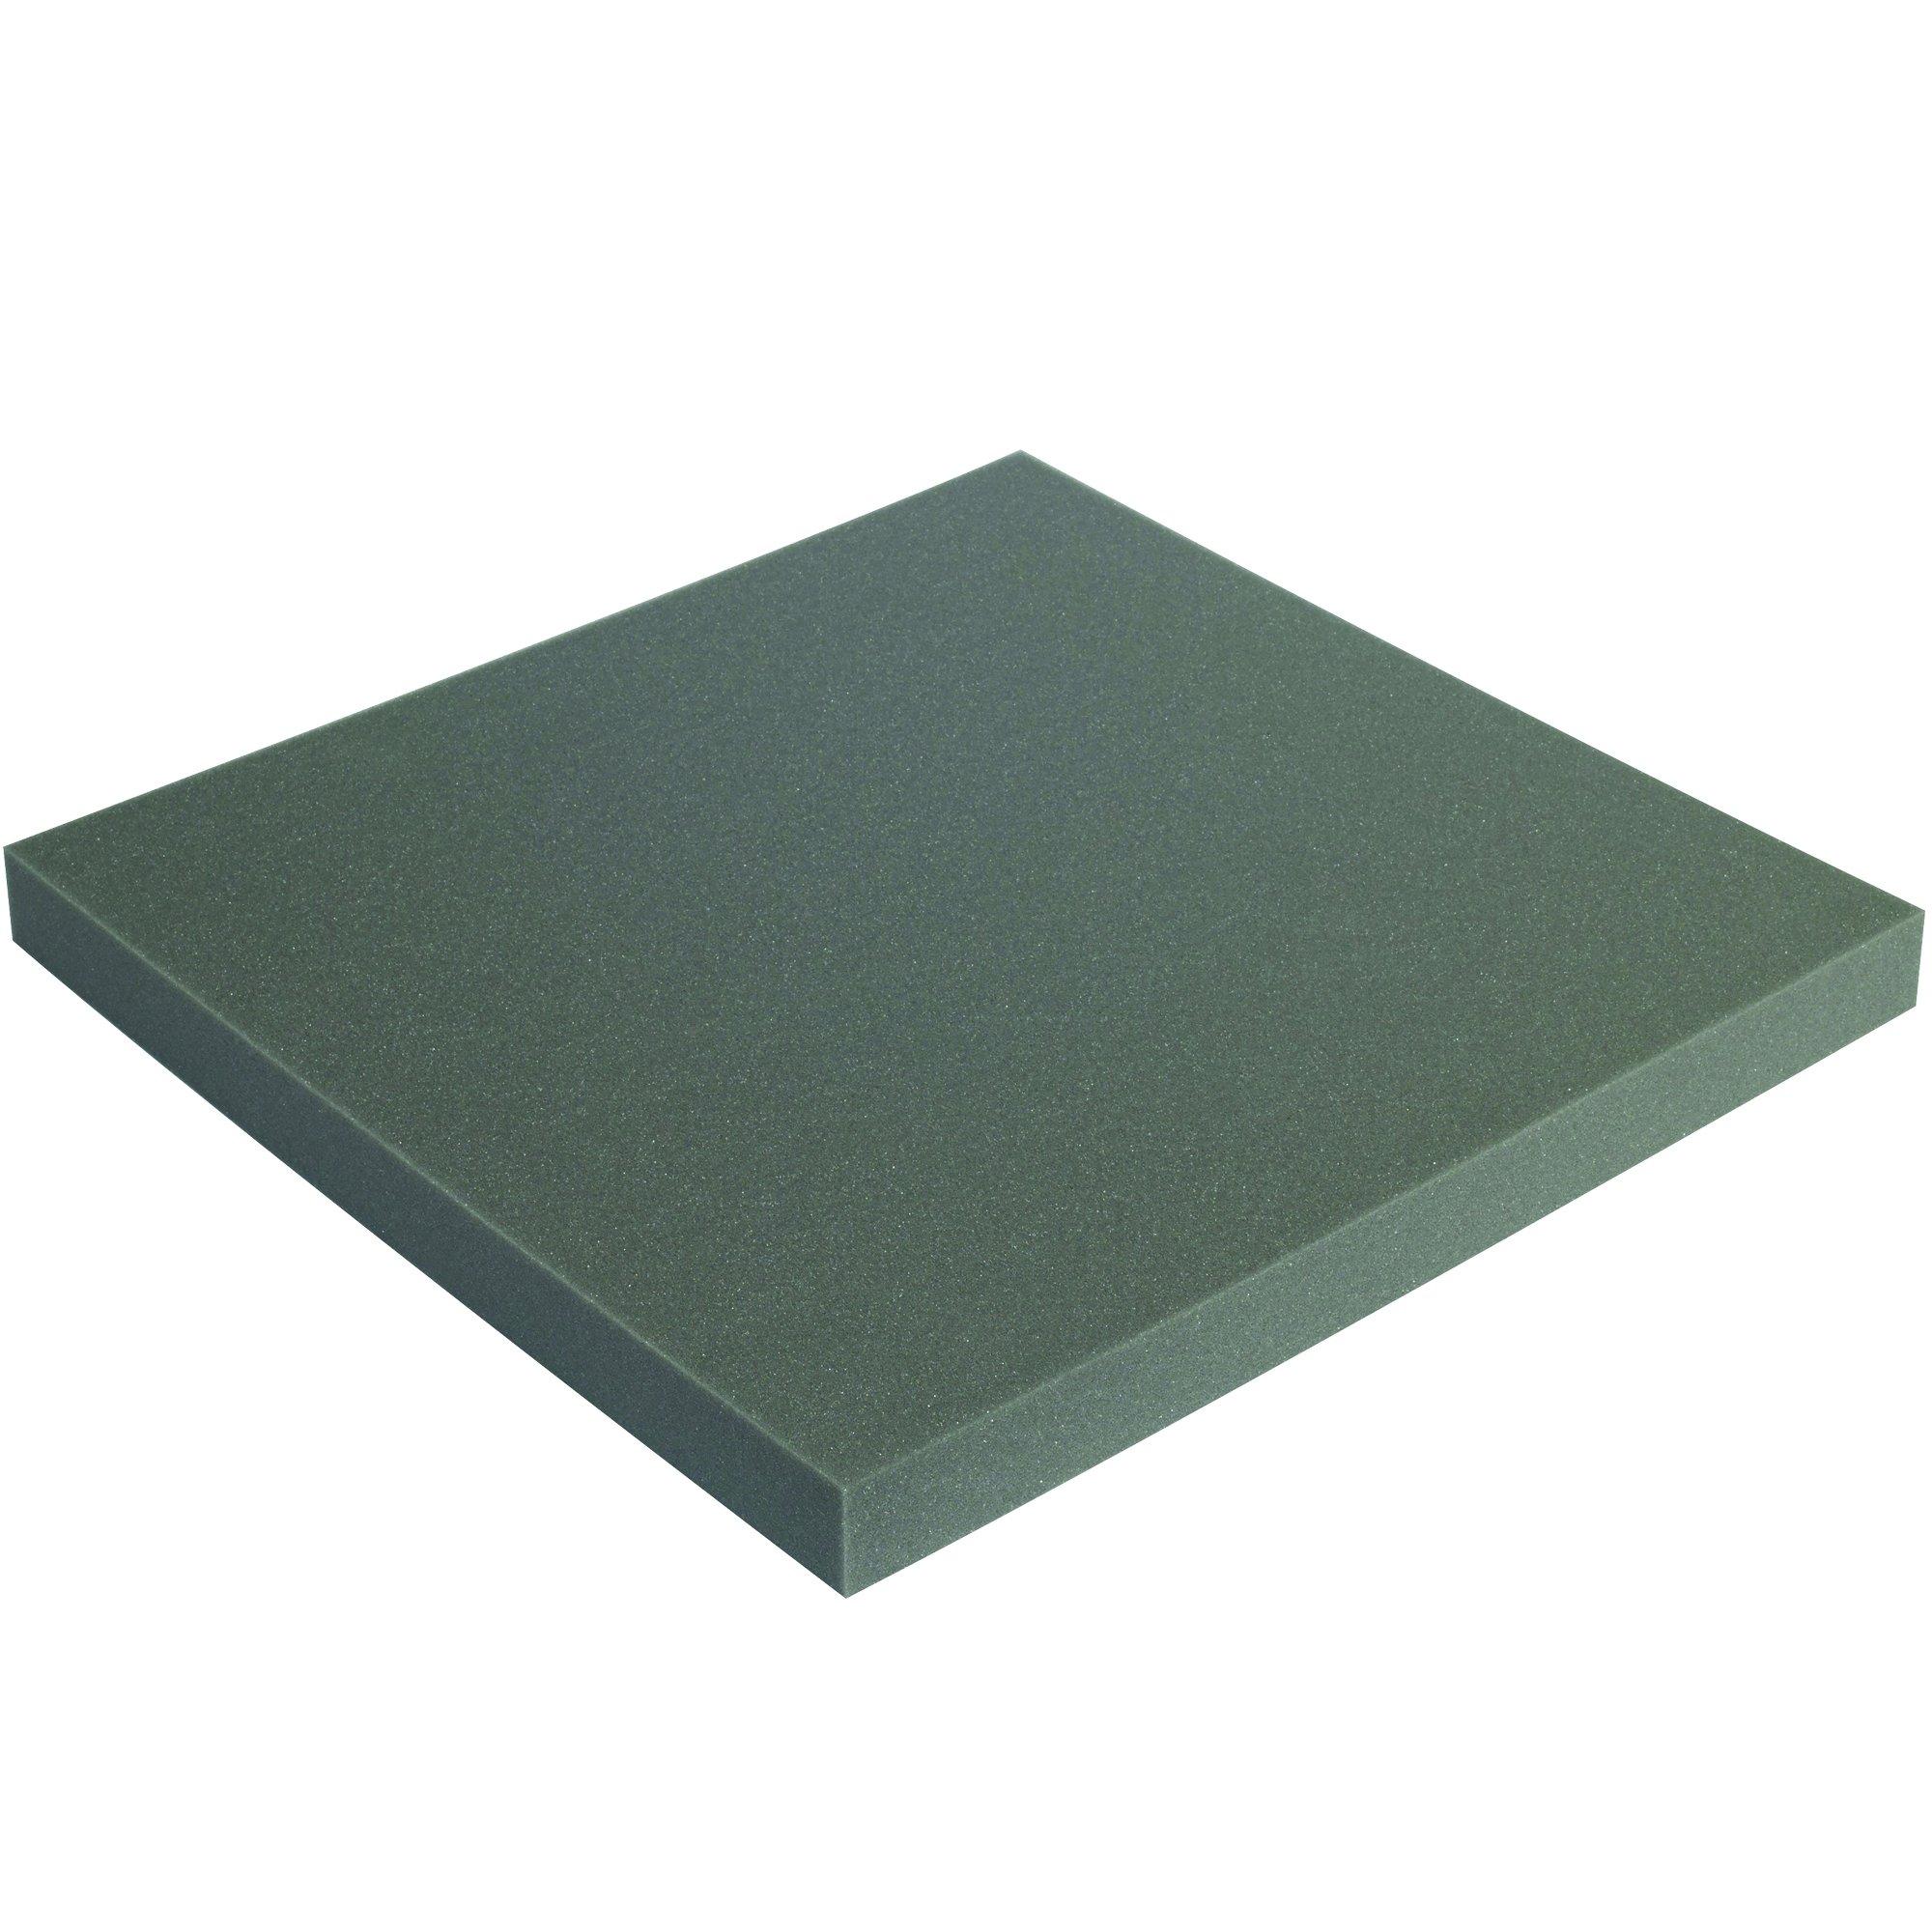 "BOX USA FSC24242 Soft Foam Sheets, 2"" x"